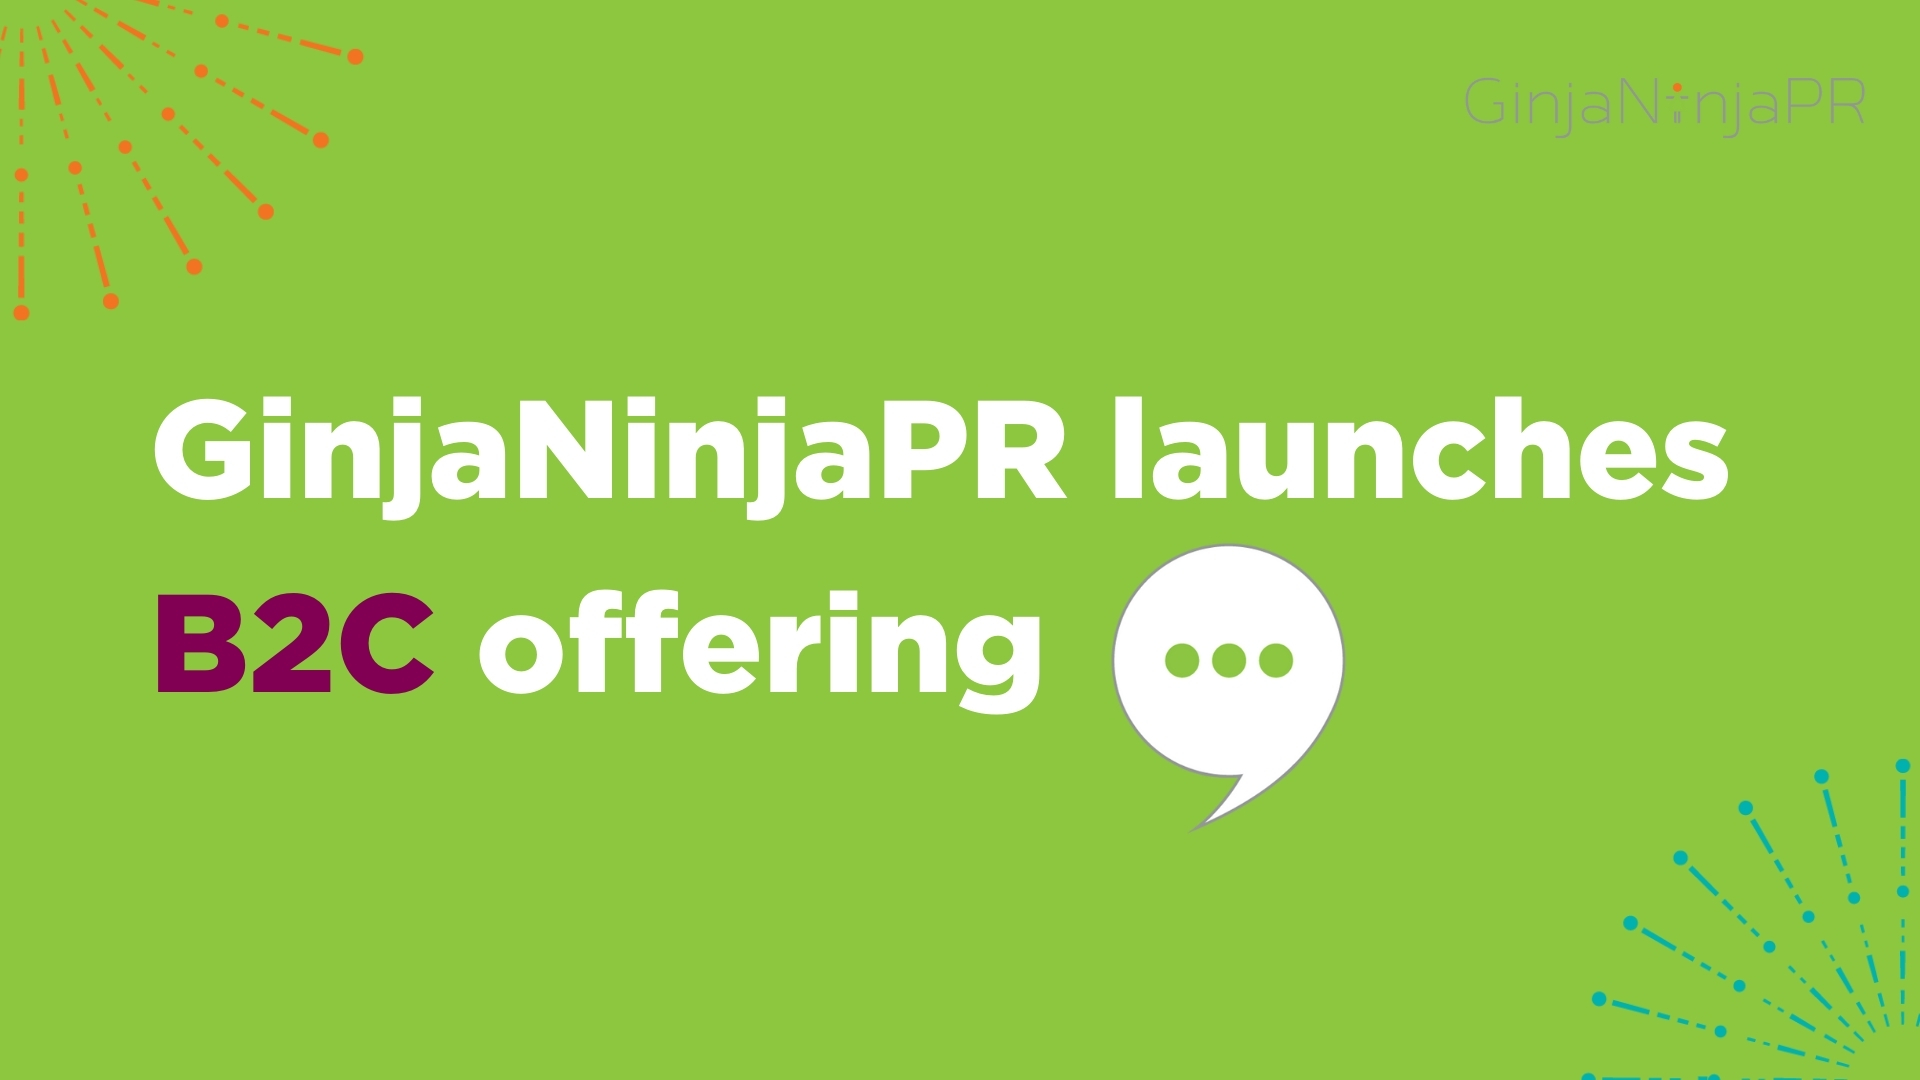 GinjaNinjaPR launches B2C offering